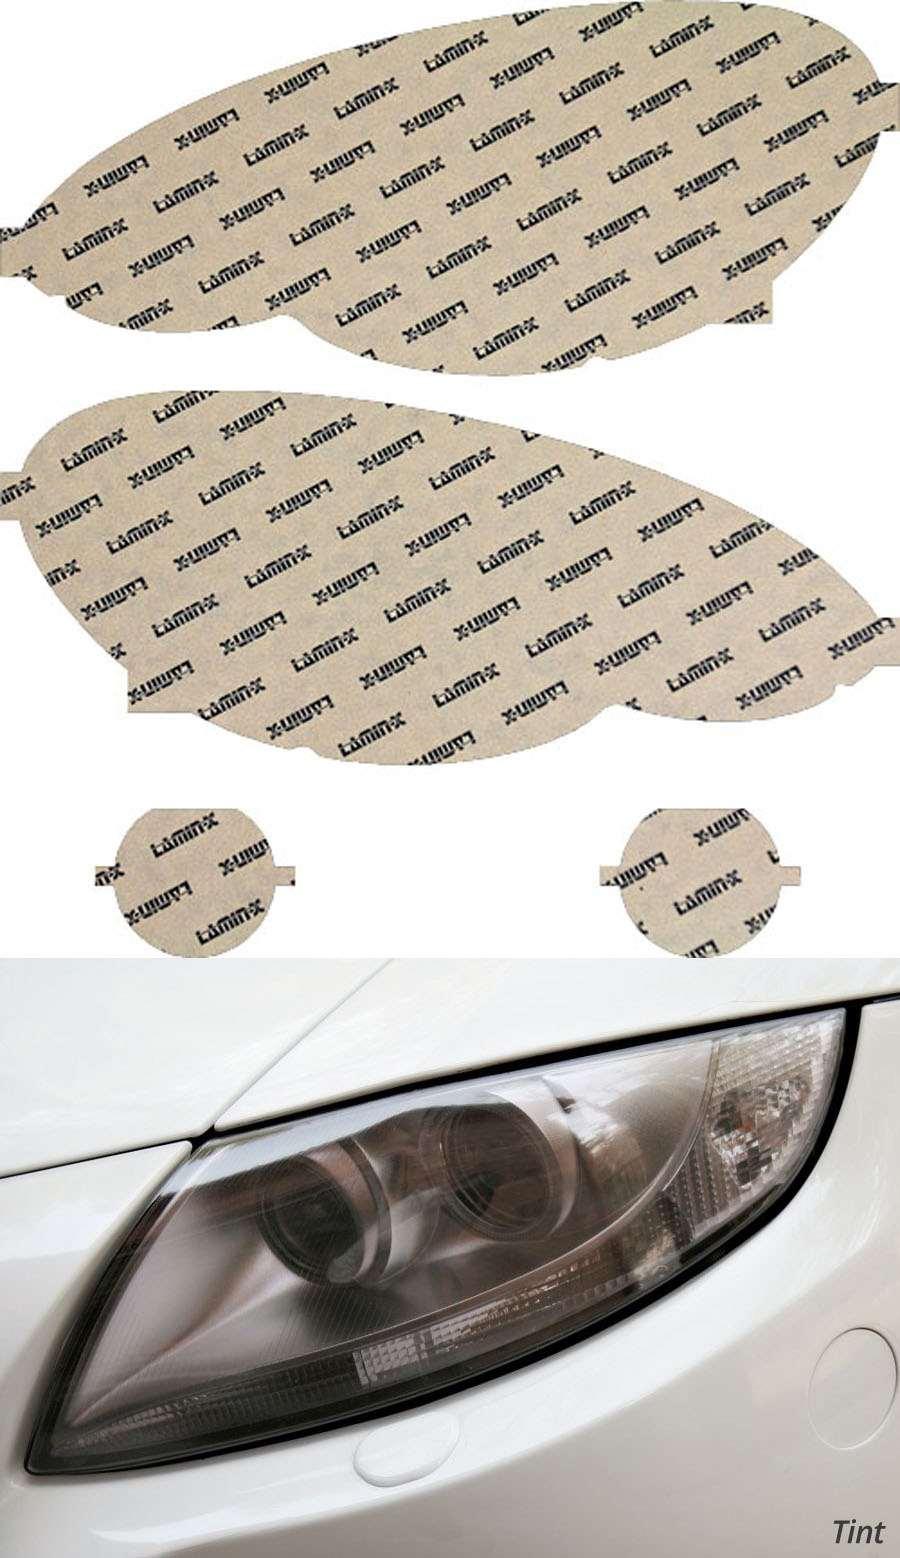 Chrysler PT Cruiser 06-10 Tint Headlight Covers Lamin-X C011T